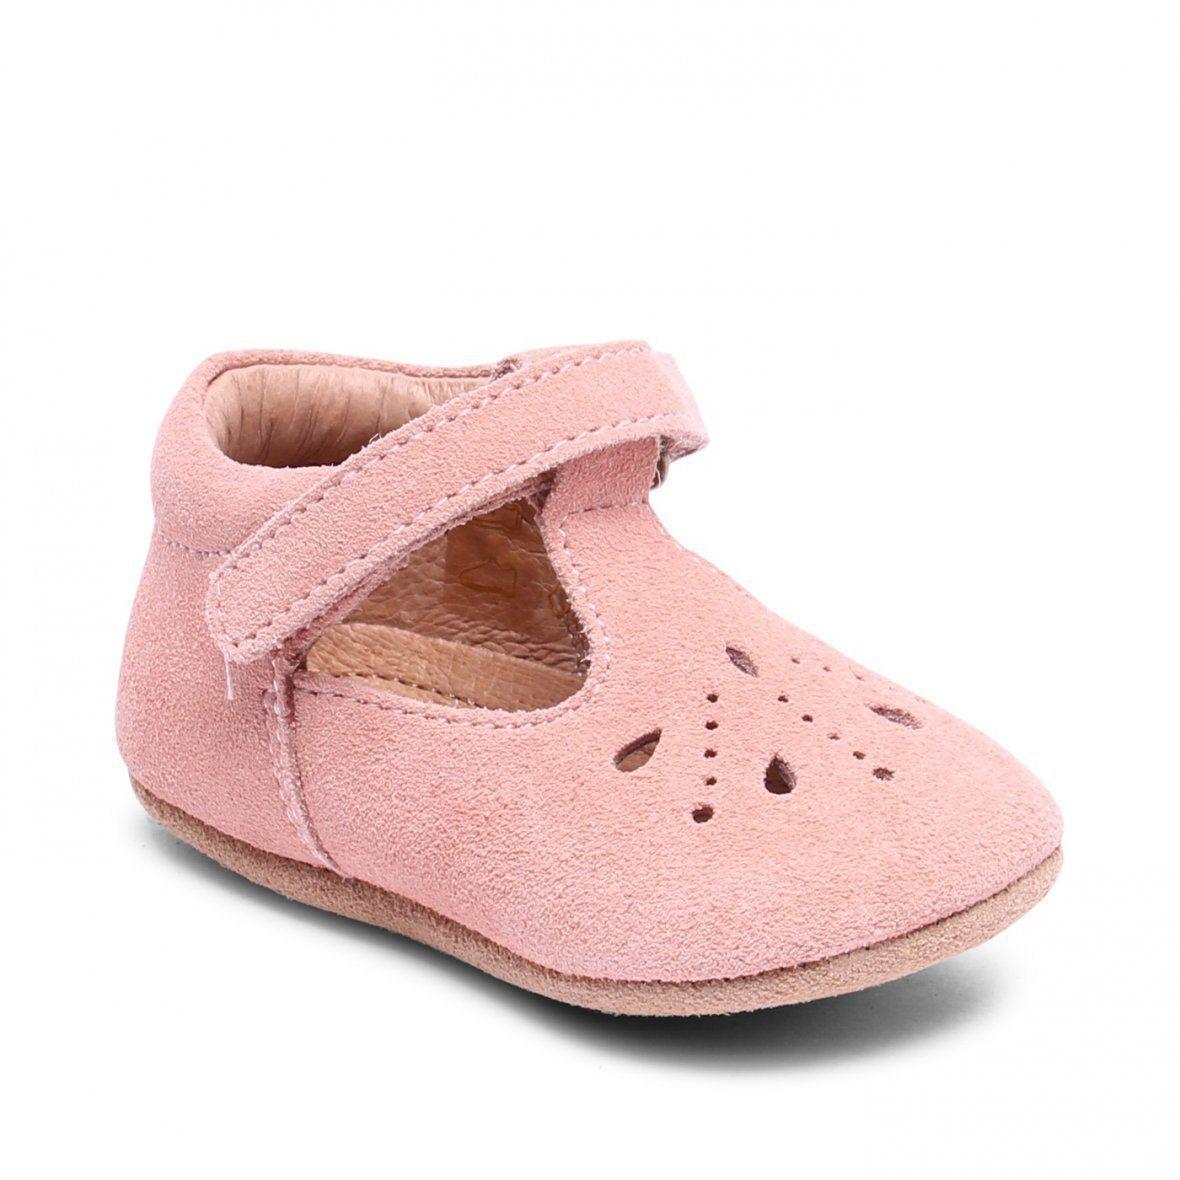 f5dfb4600ec Bisgaard - Peach - Hjemmesko - 21 - Loafers